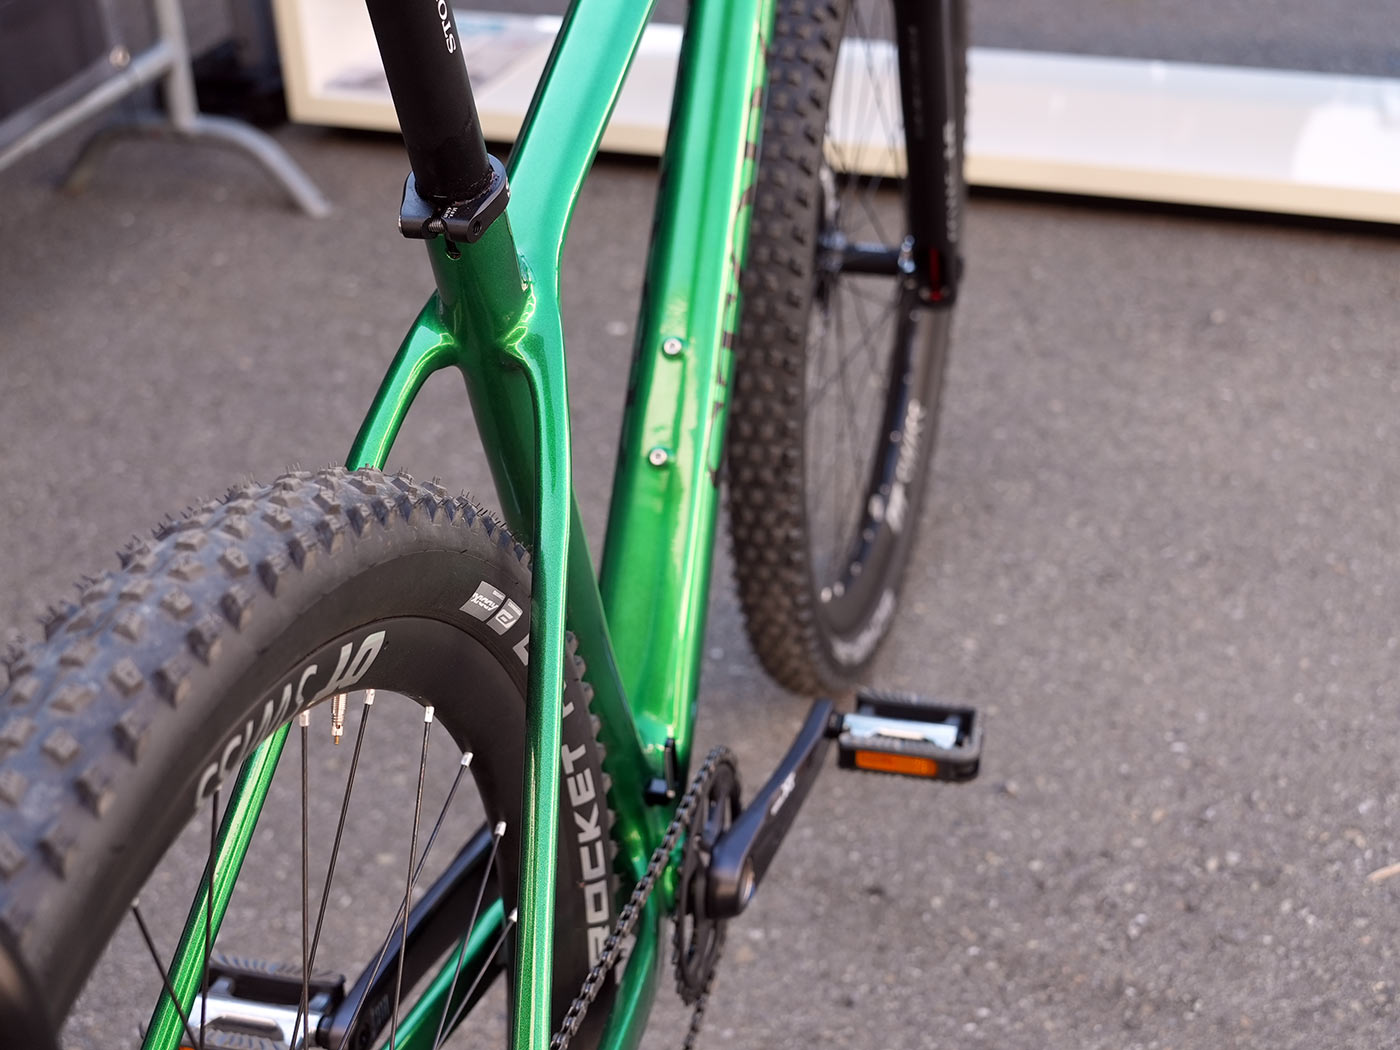 2022 stork rebel 4 lightweight carbon hardtail mountain bike chainstay closeup